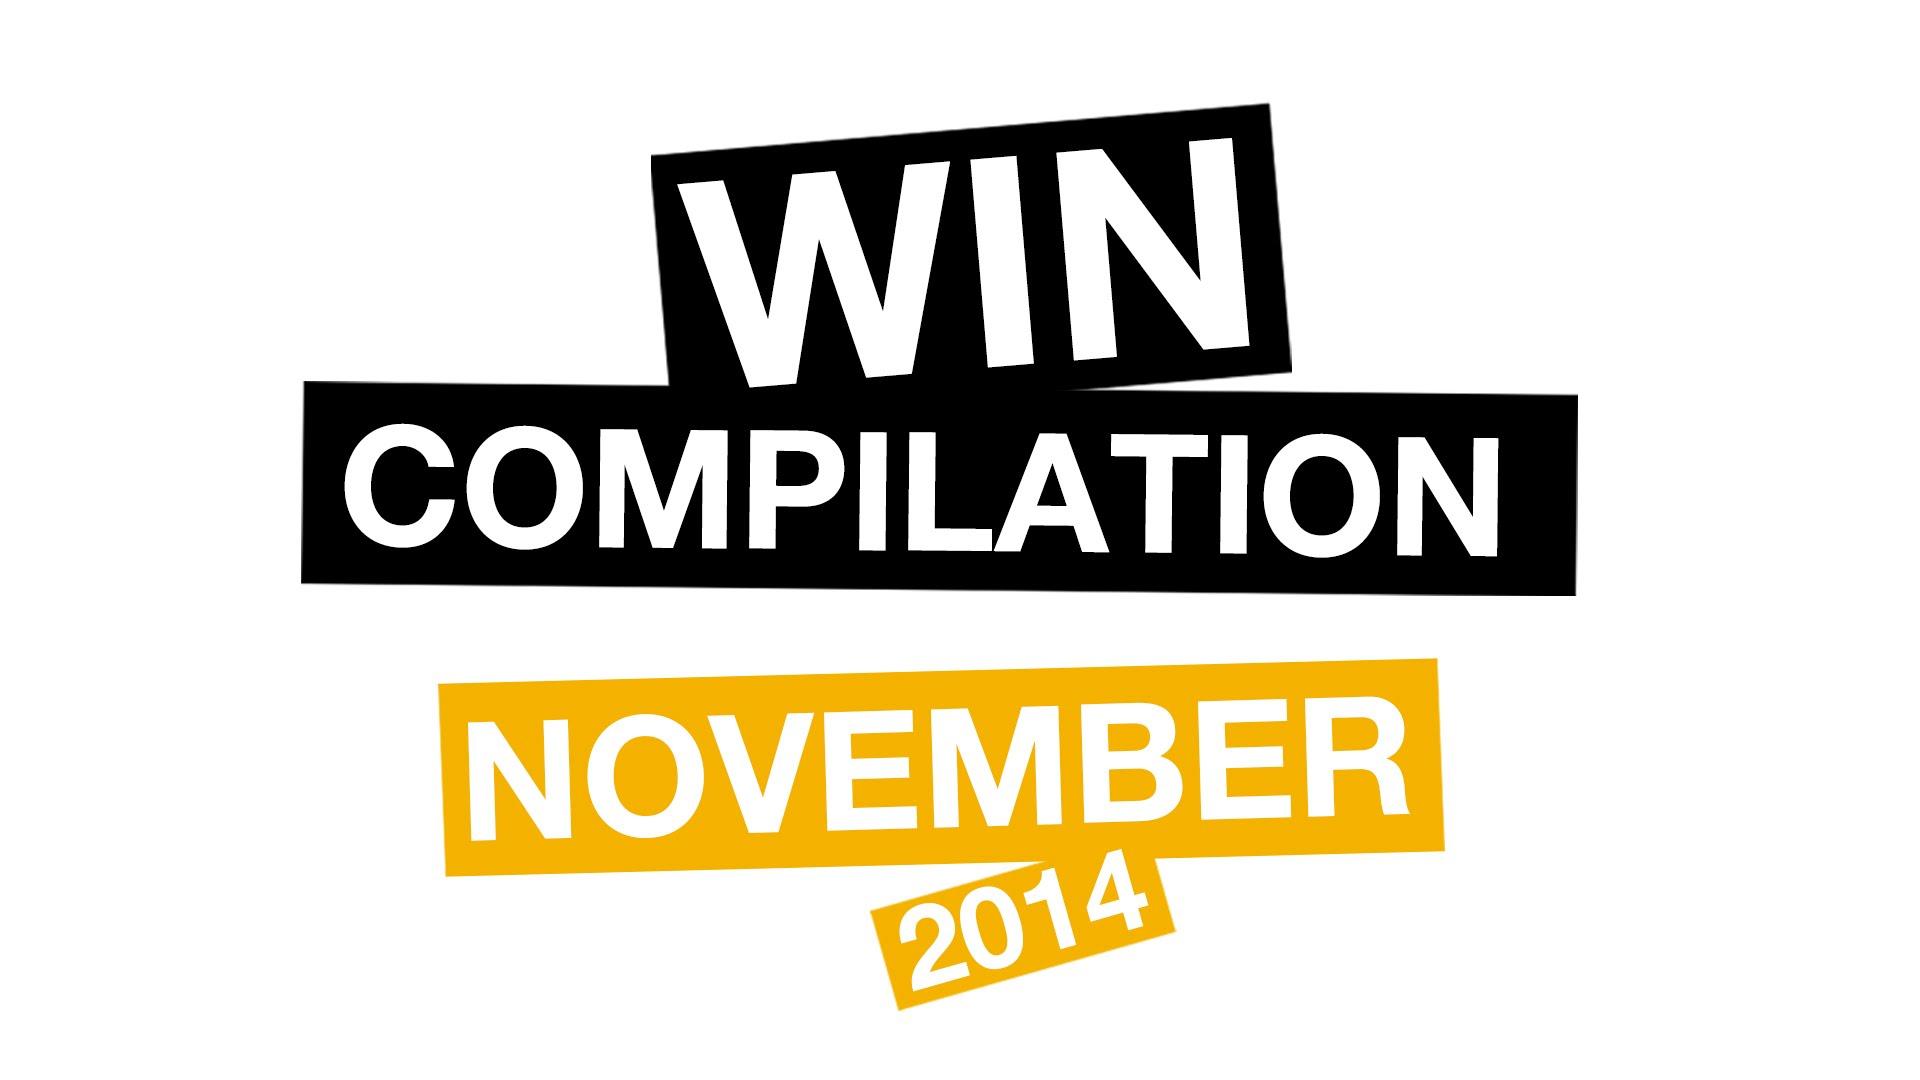 WIN Compilation November 2014